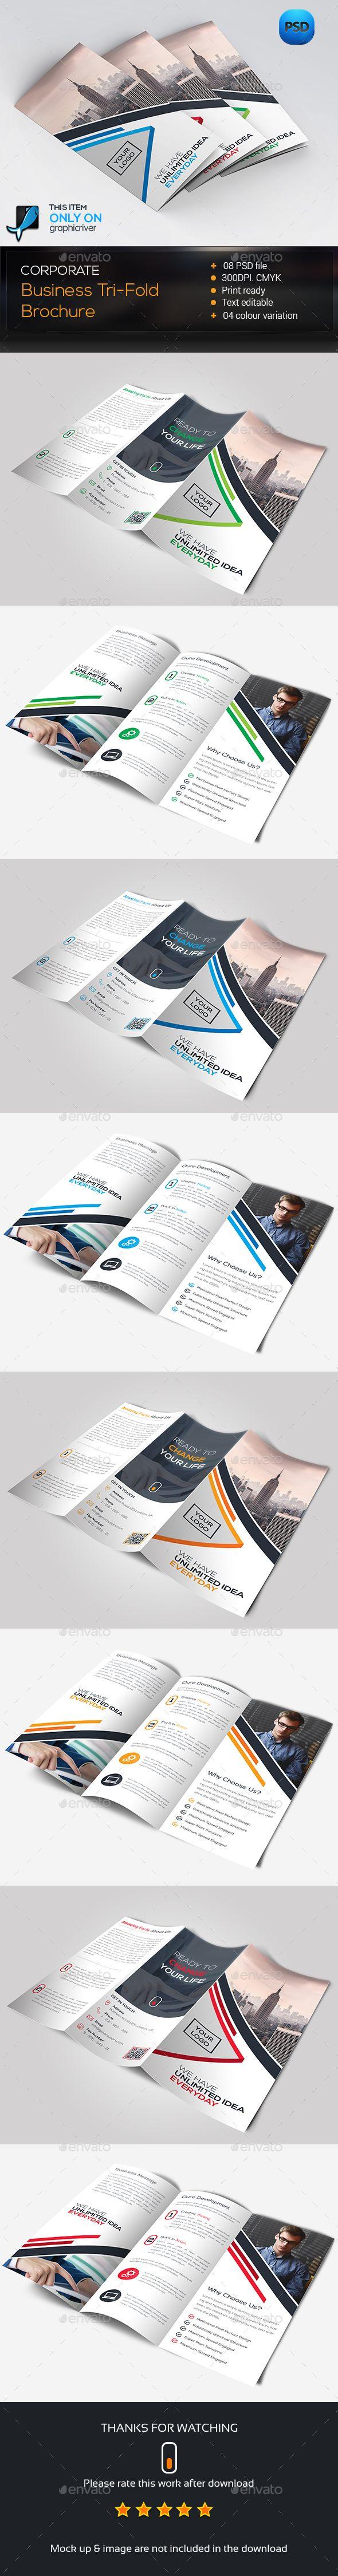 Trifold Brochure Template PSD #design Download: http://graphicriver.net/item/trifold-brochure/14230259?ref=ksioks